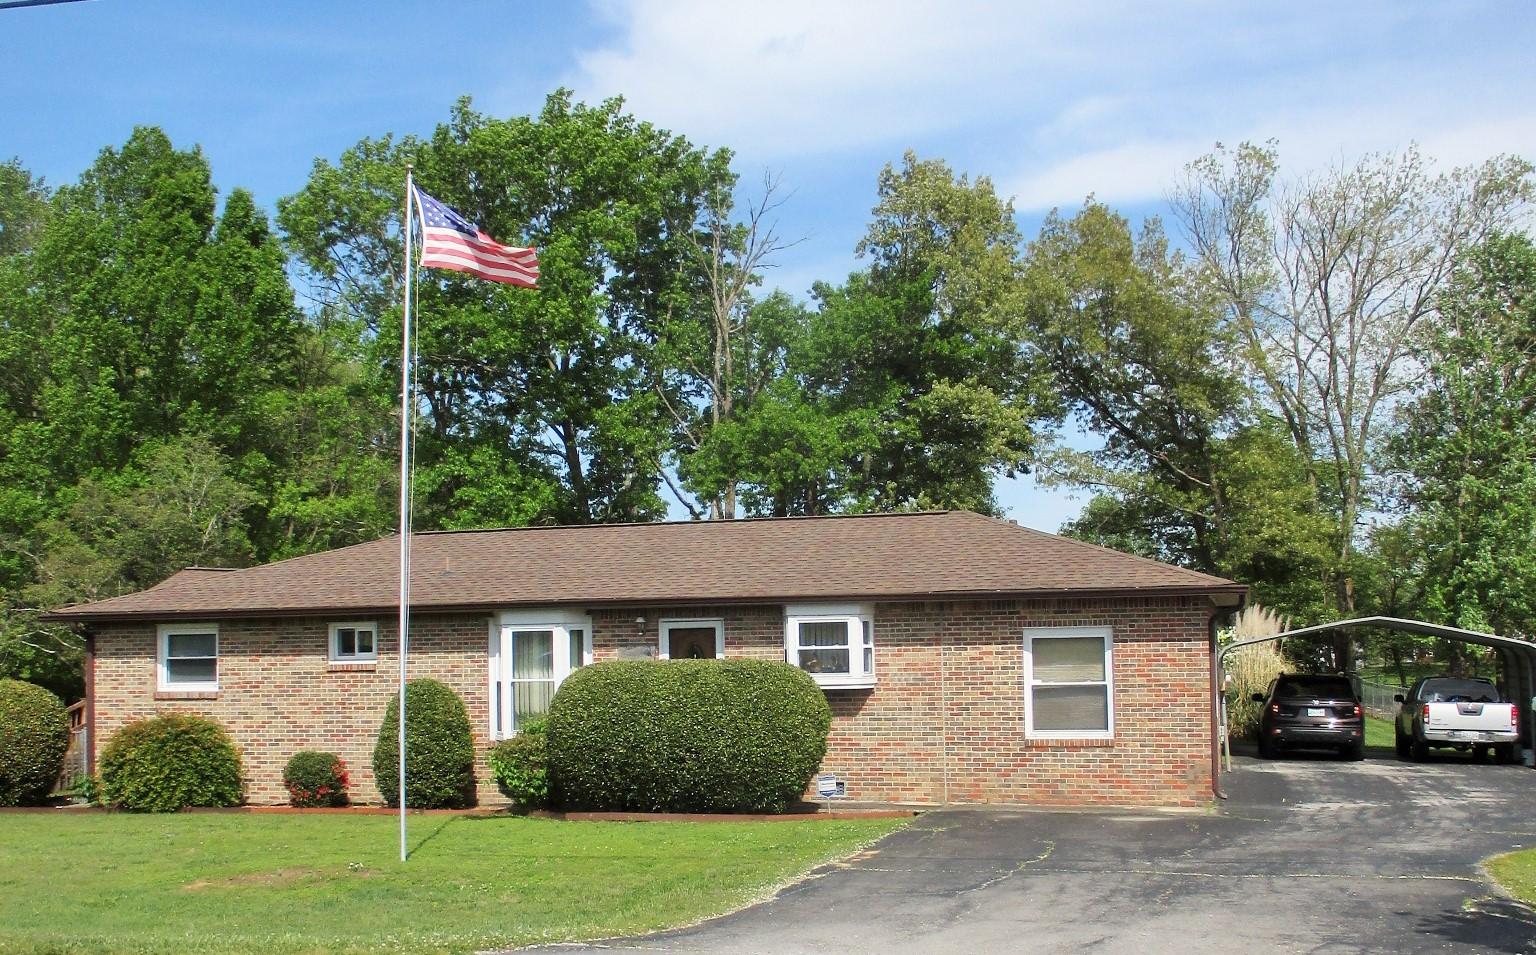 72 Shawna Ln Property Photo - Hillsboro, TN real estate listing